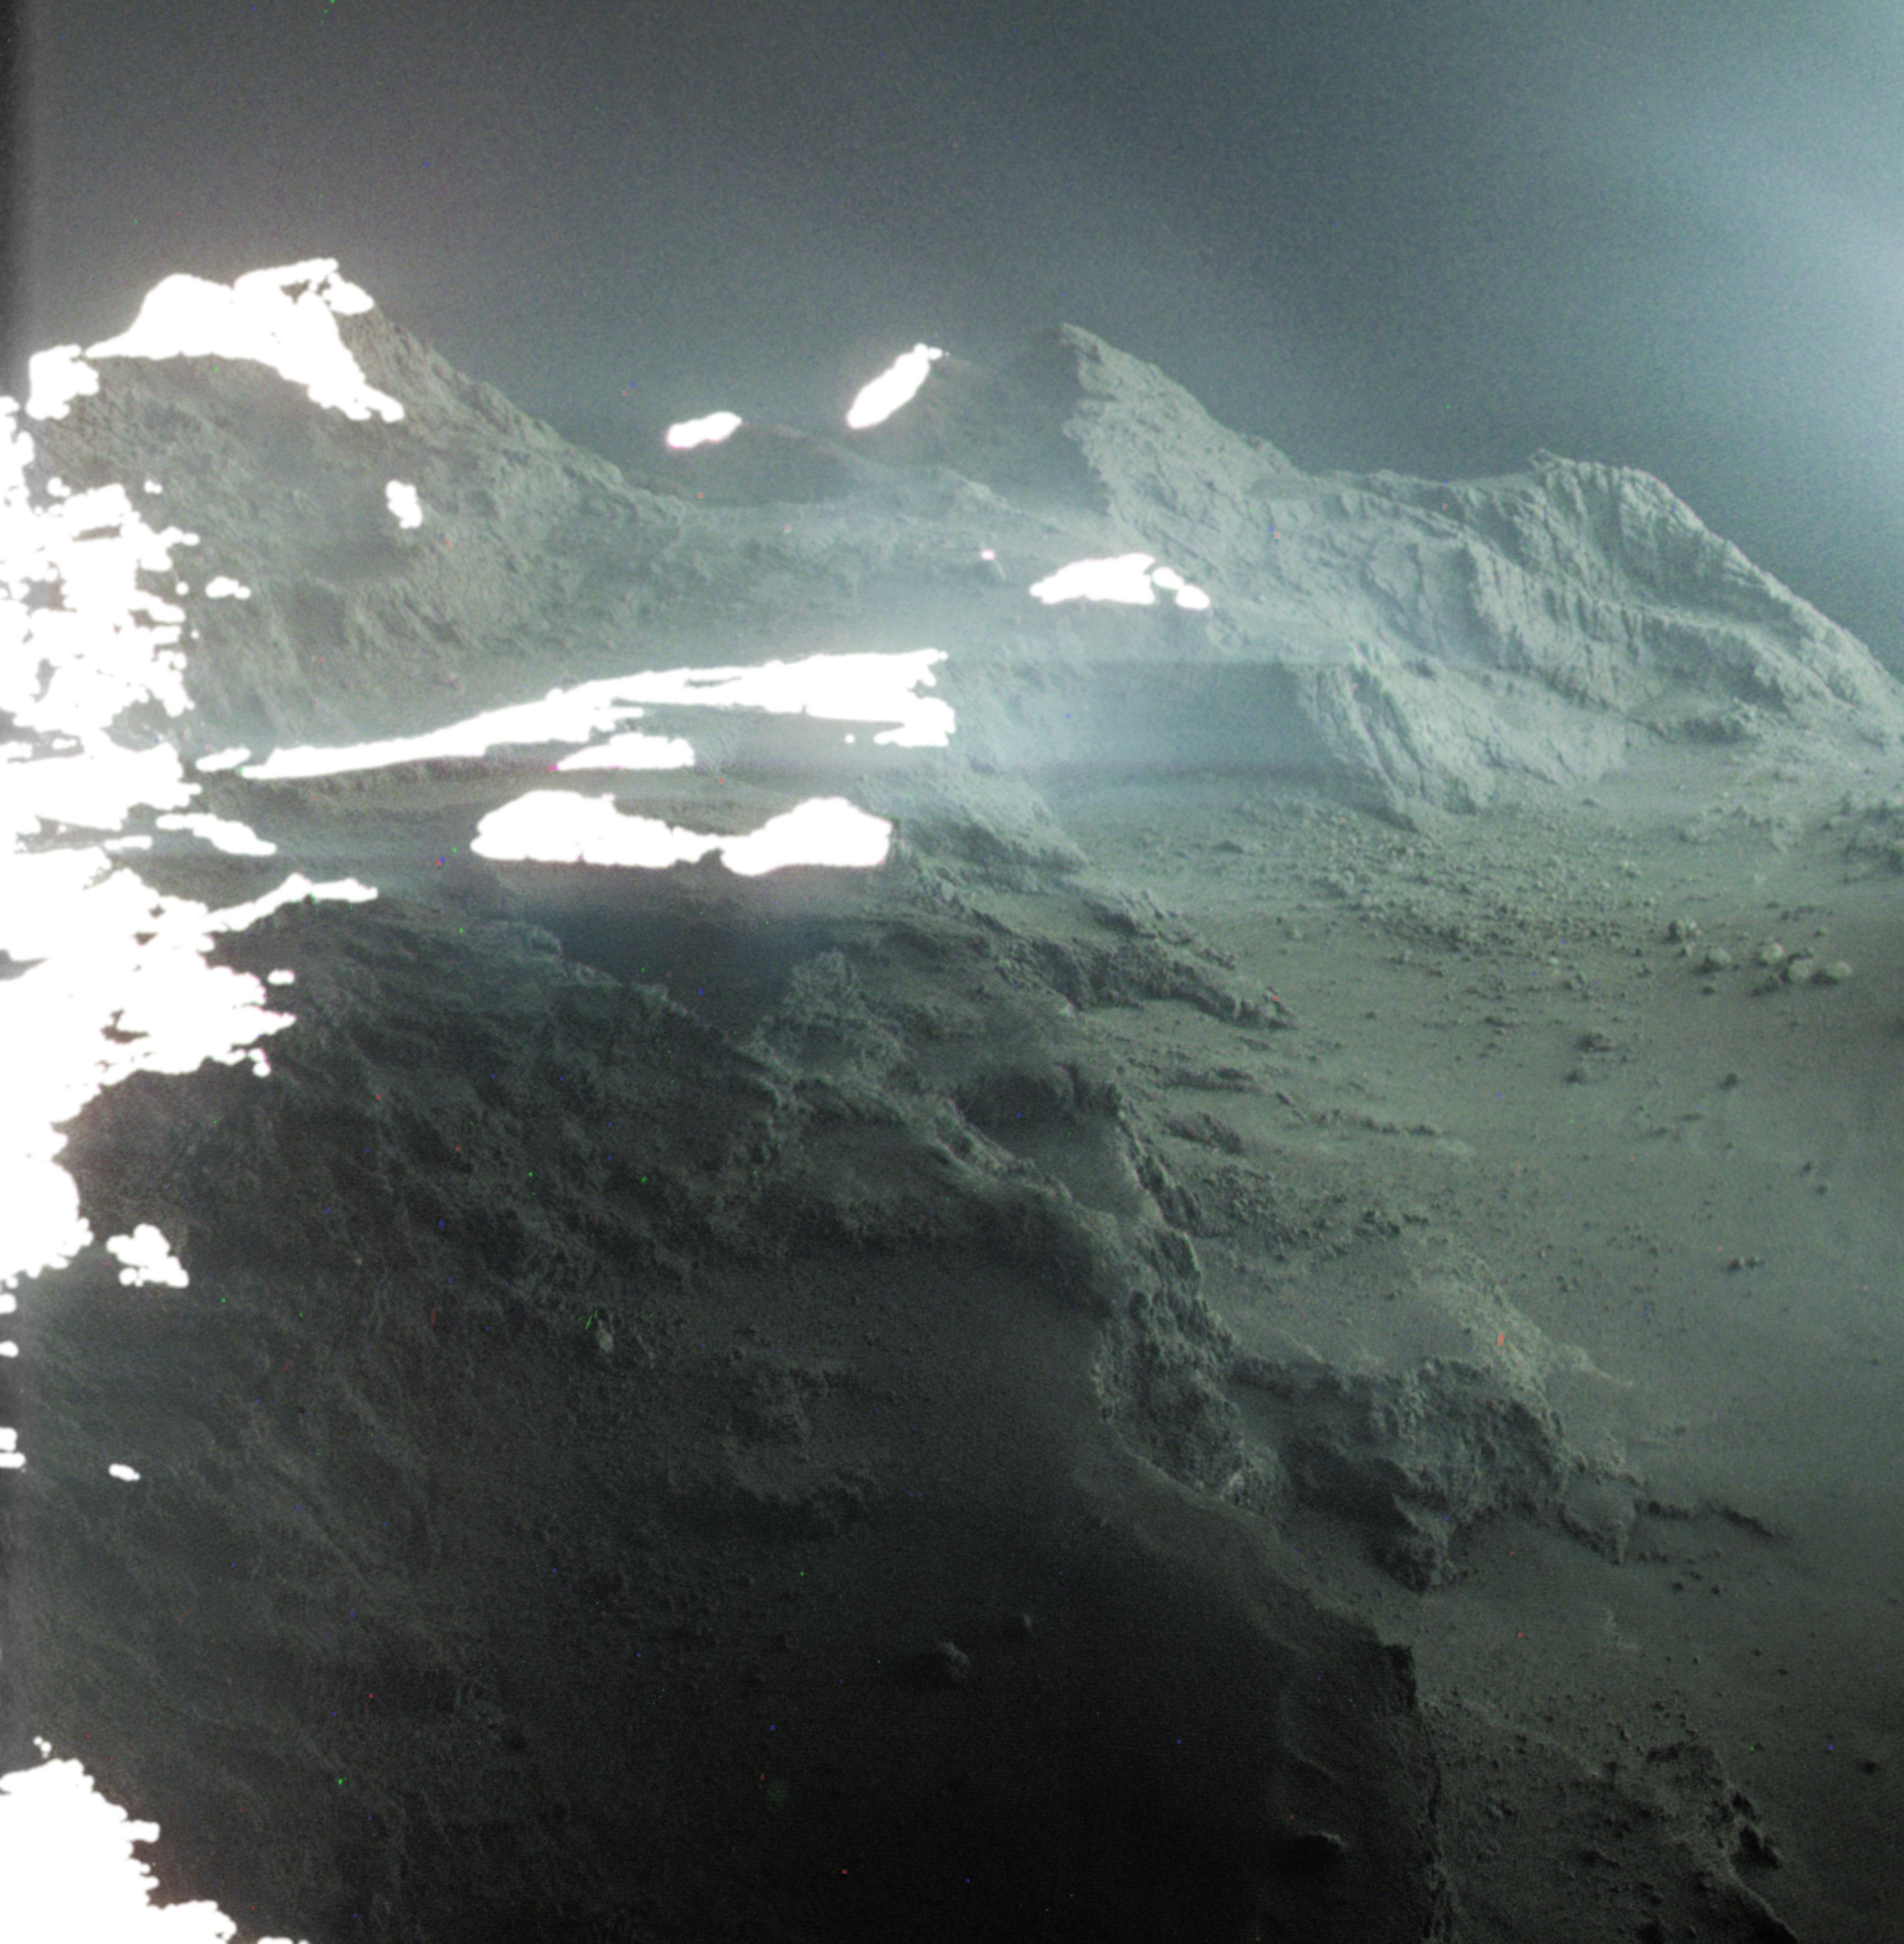 Image captured by ESA's Rosetta spacecraft of the surface of Comet 67P/Churyumov-Gerasimenko